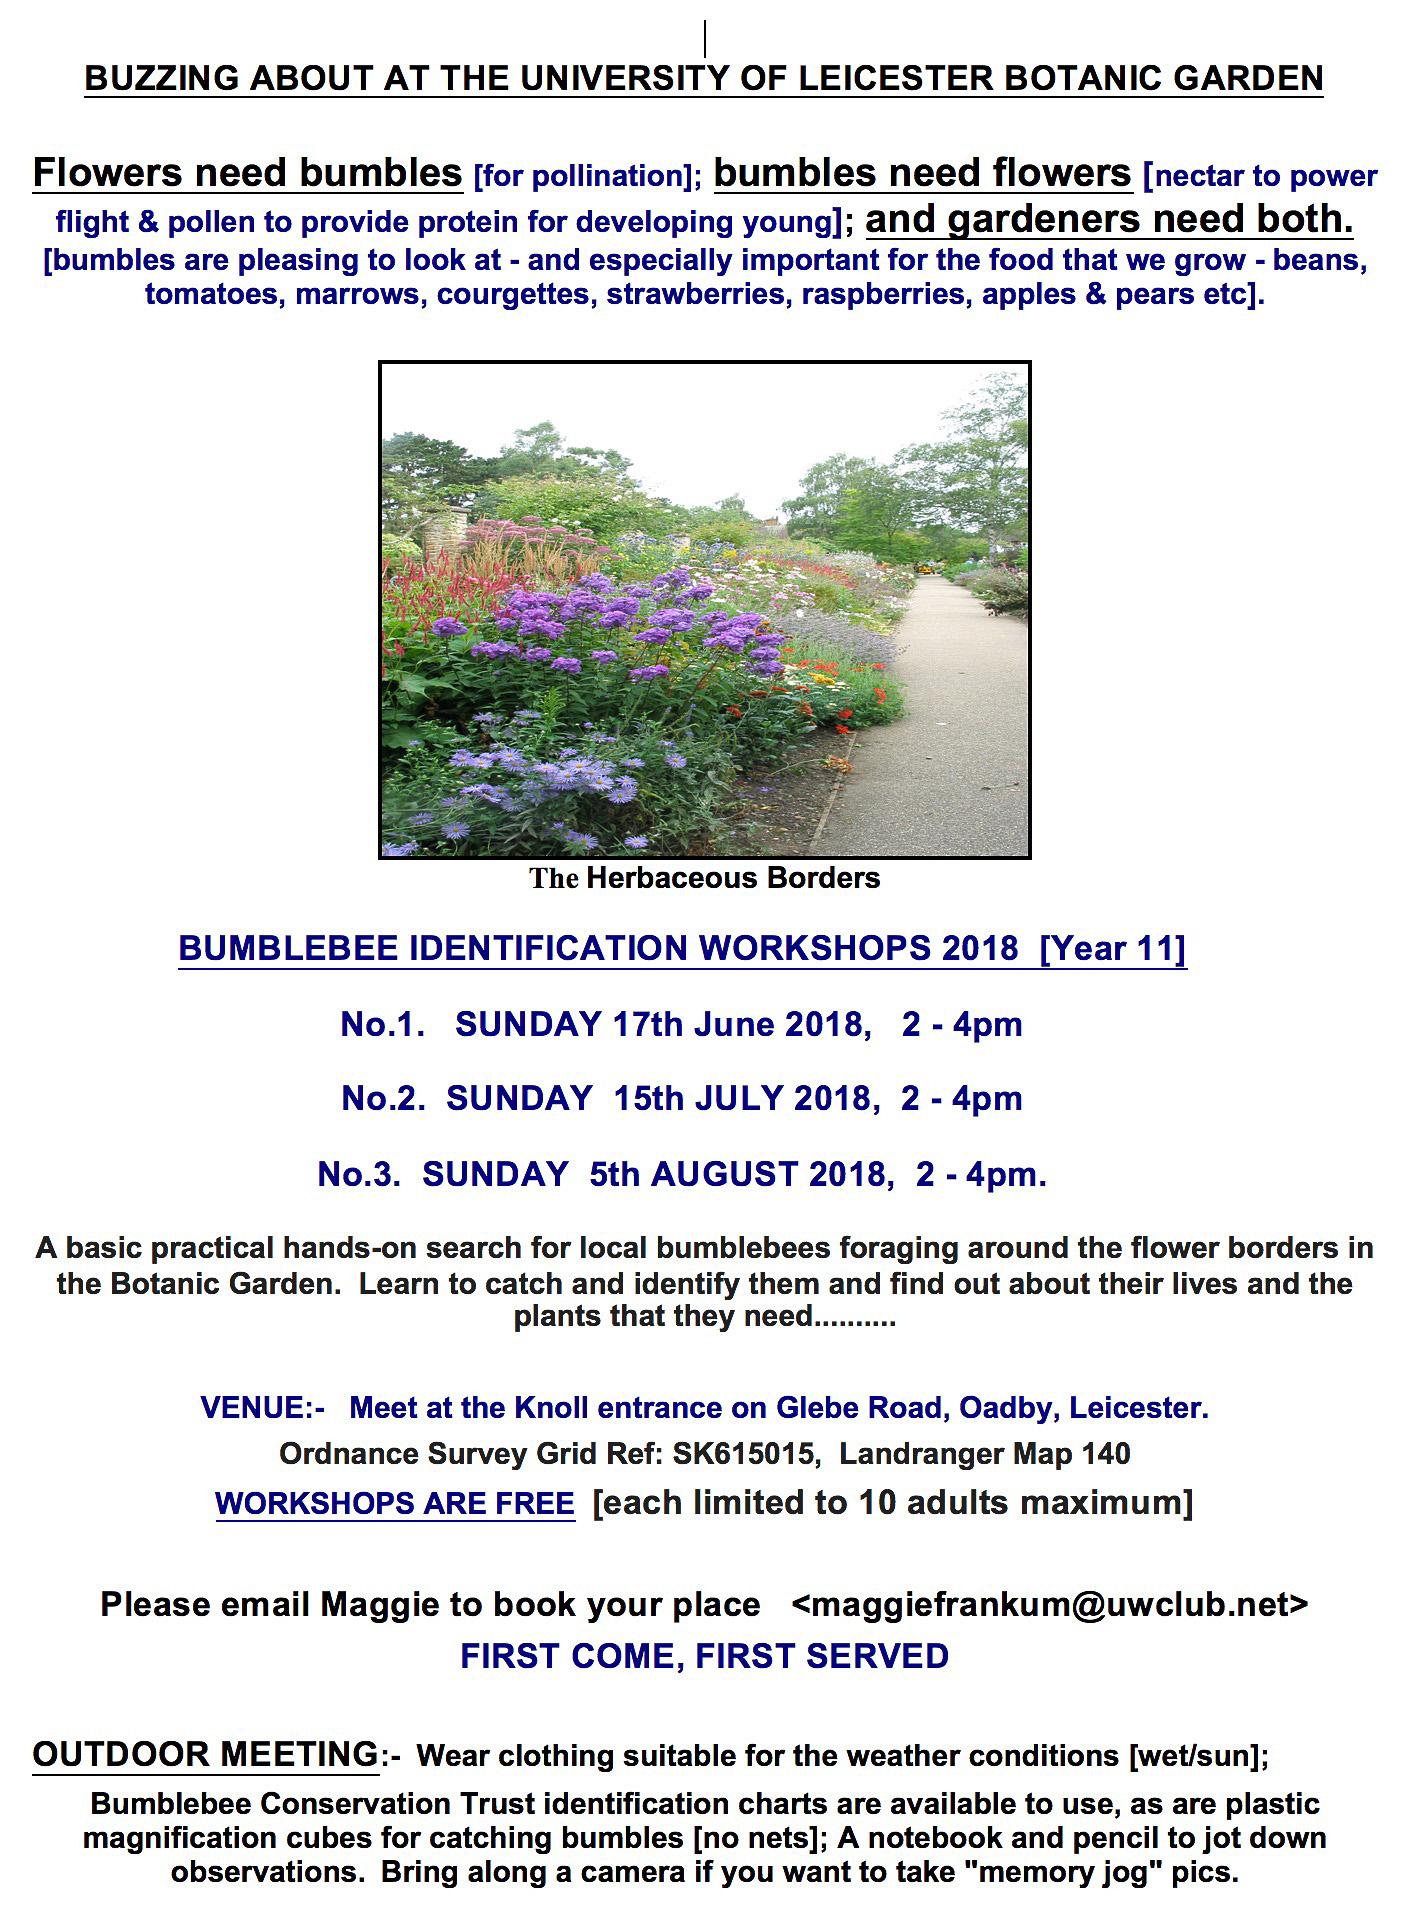 Bumblebee Identification Workshops